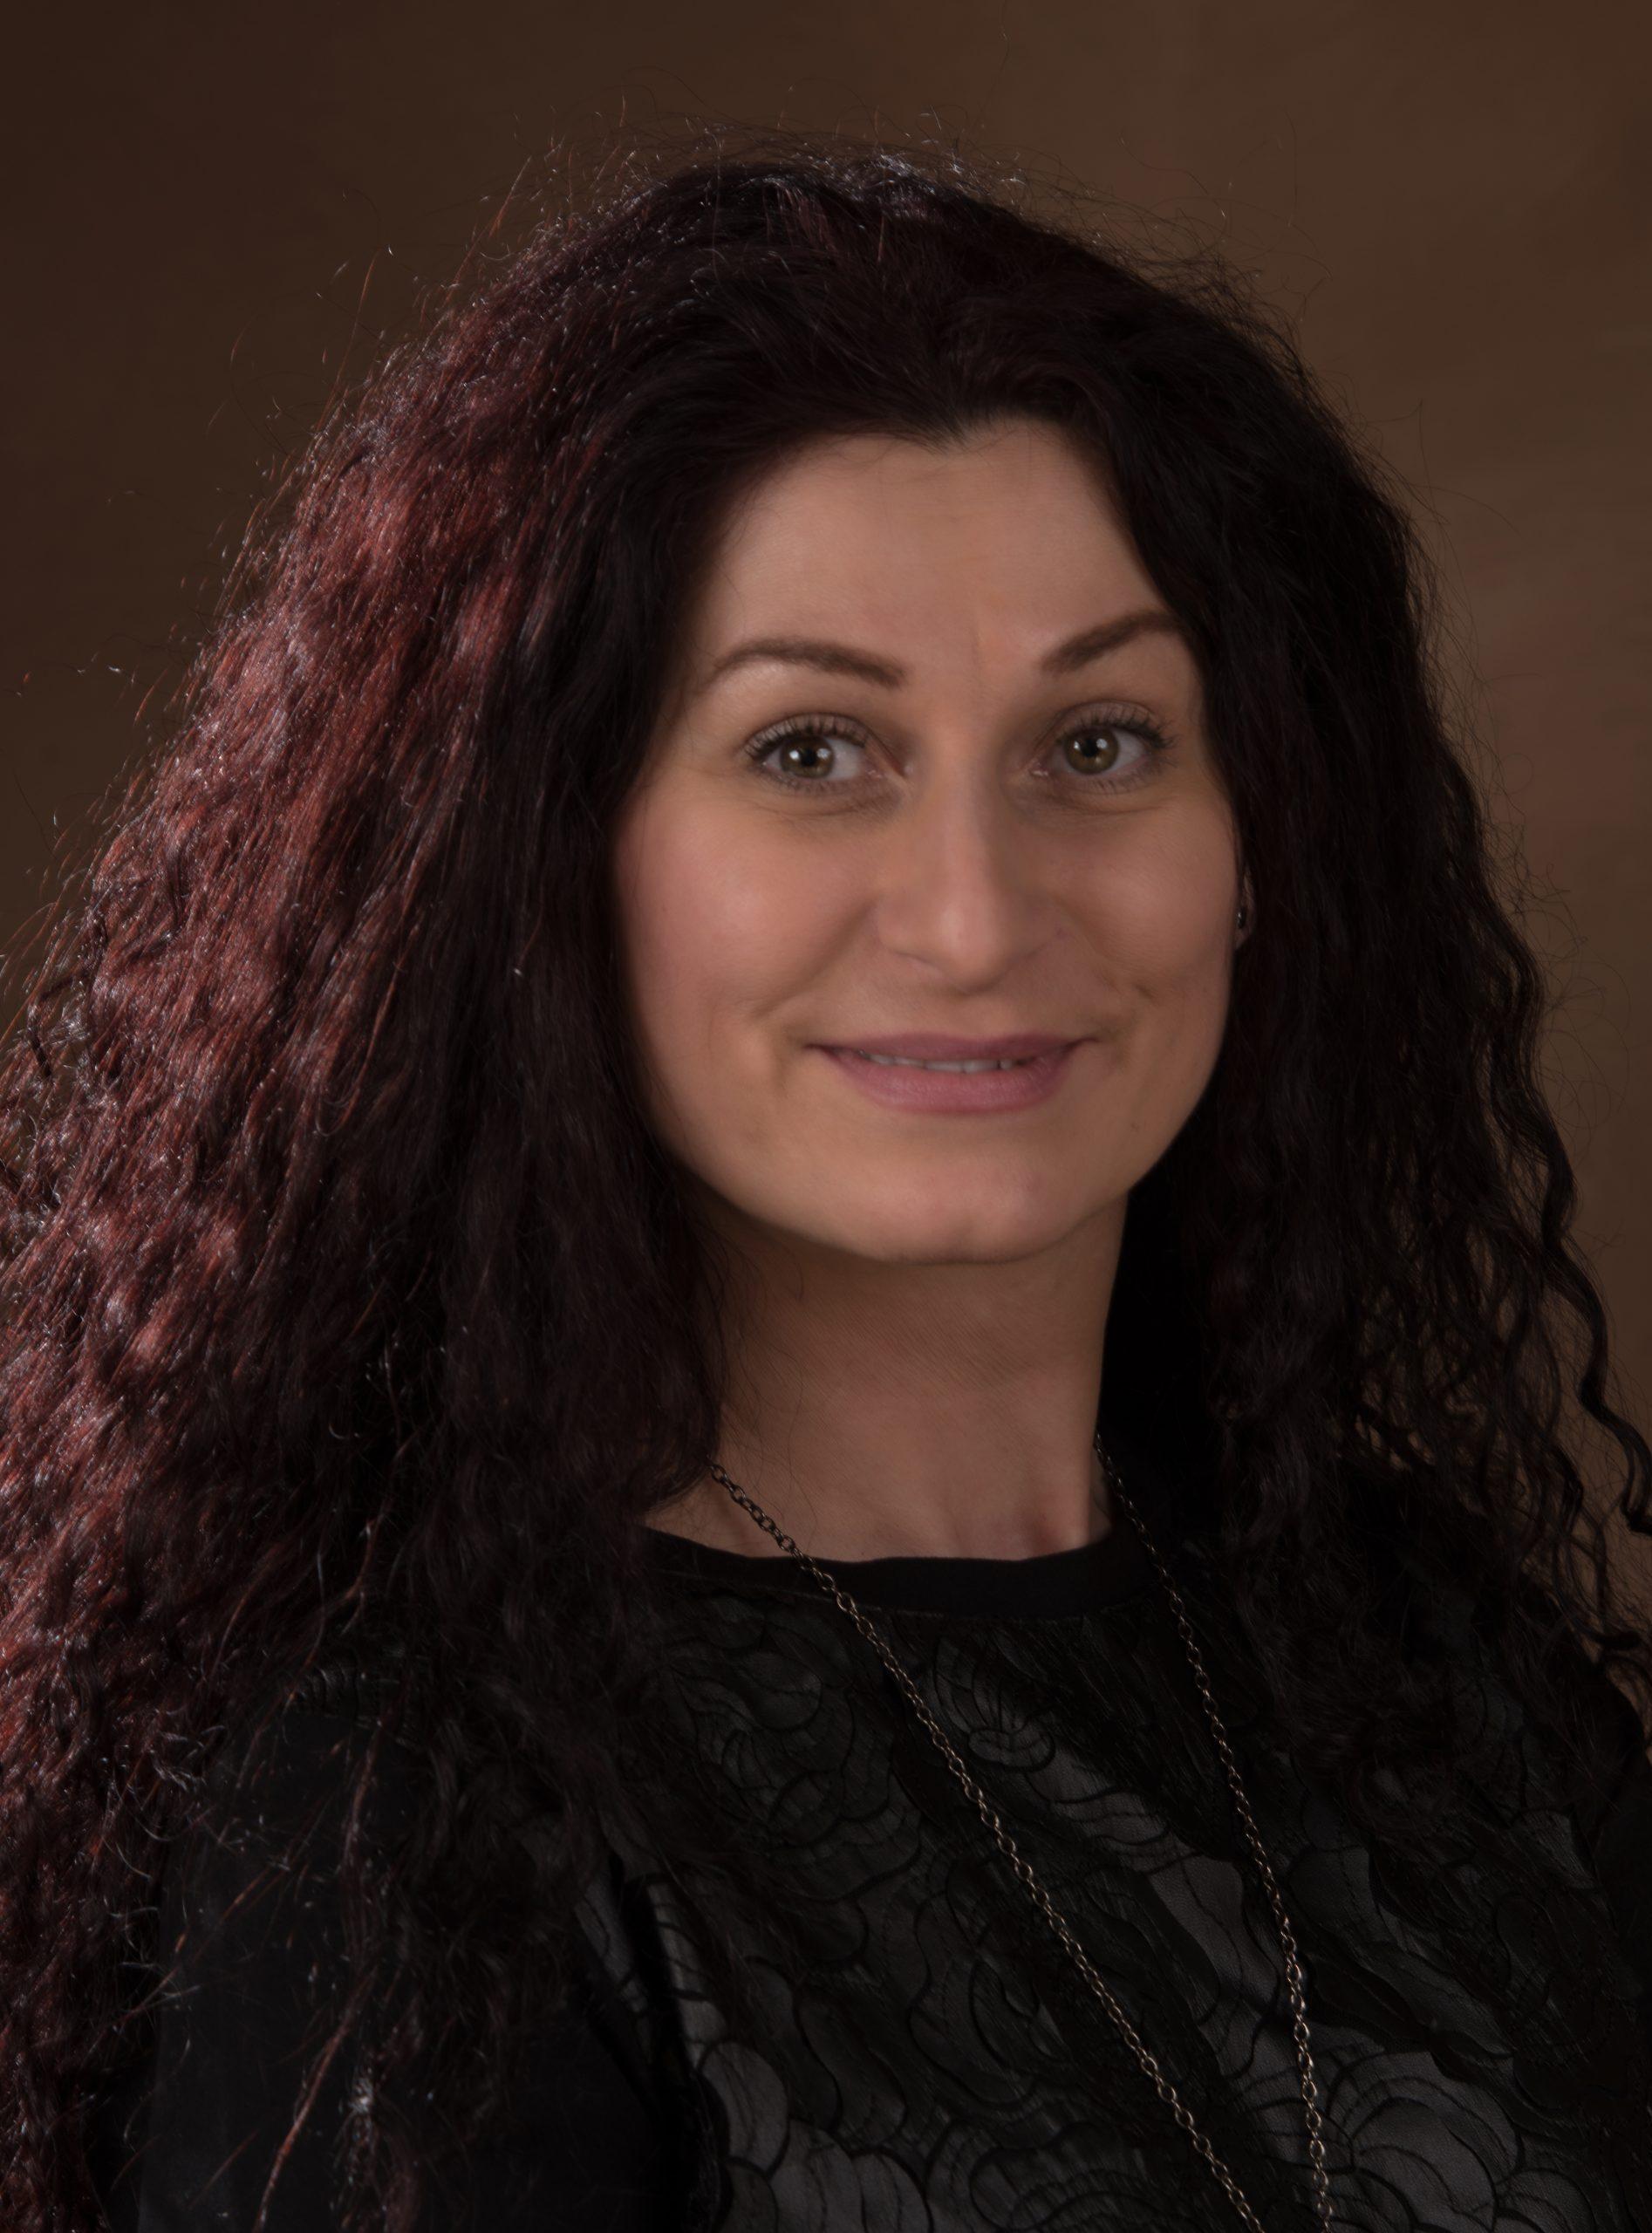 Tina Chakarova